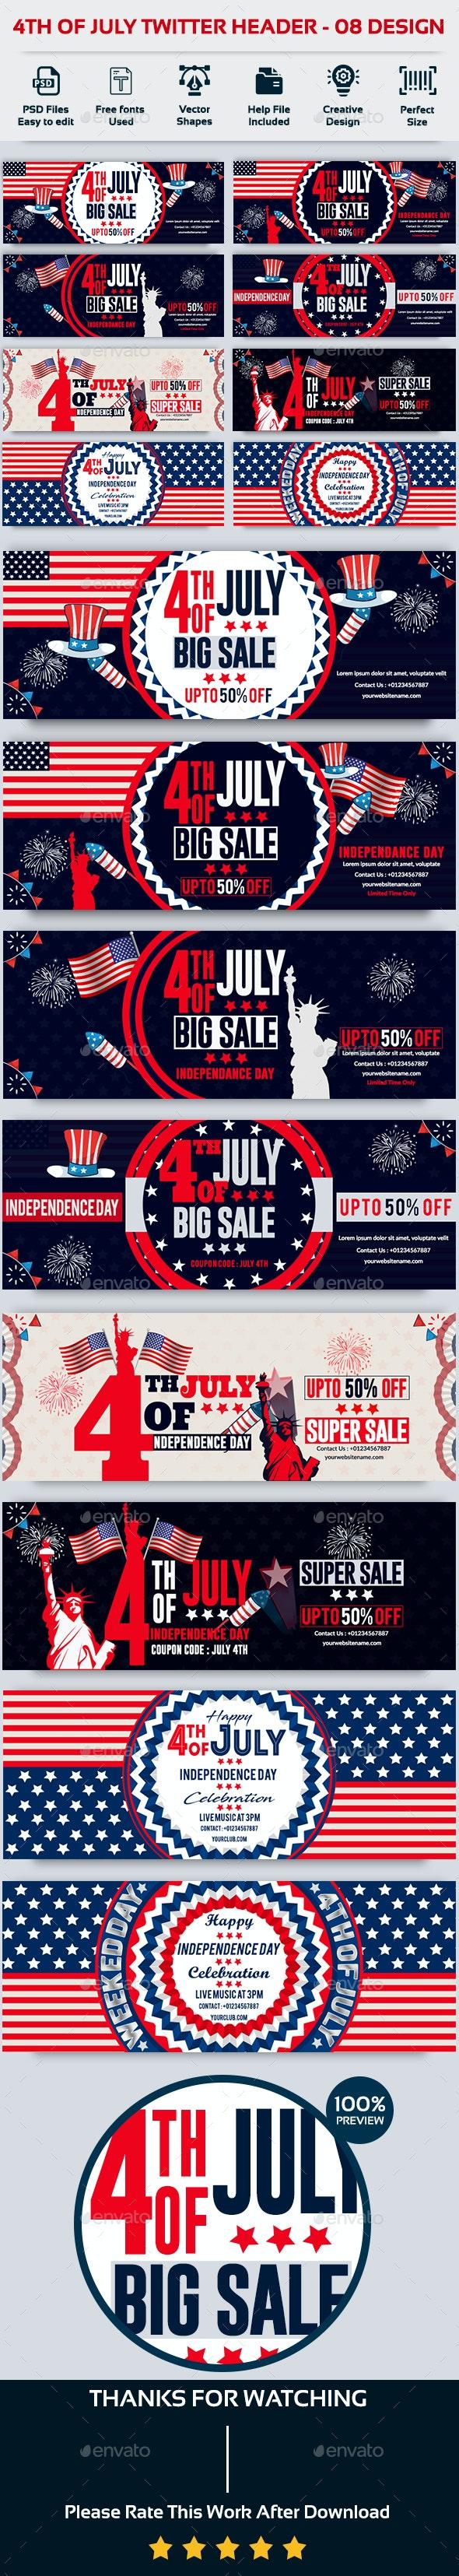 4th of July Twitter Header-Bundle -8 Design - Twitter Social Media